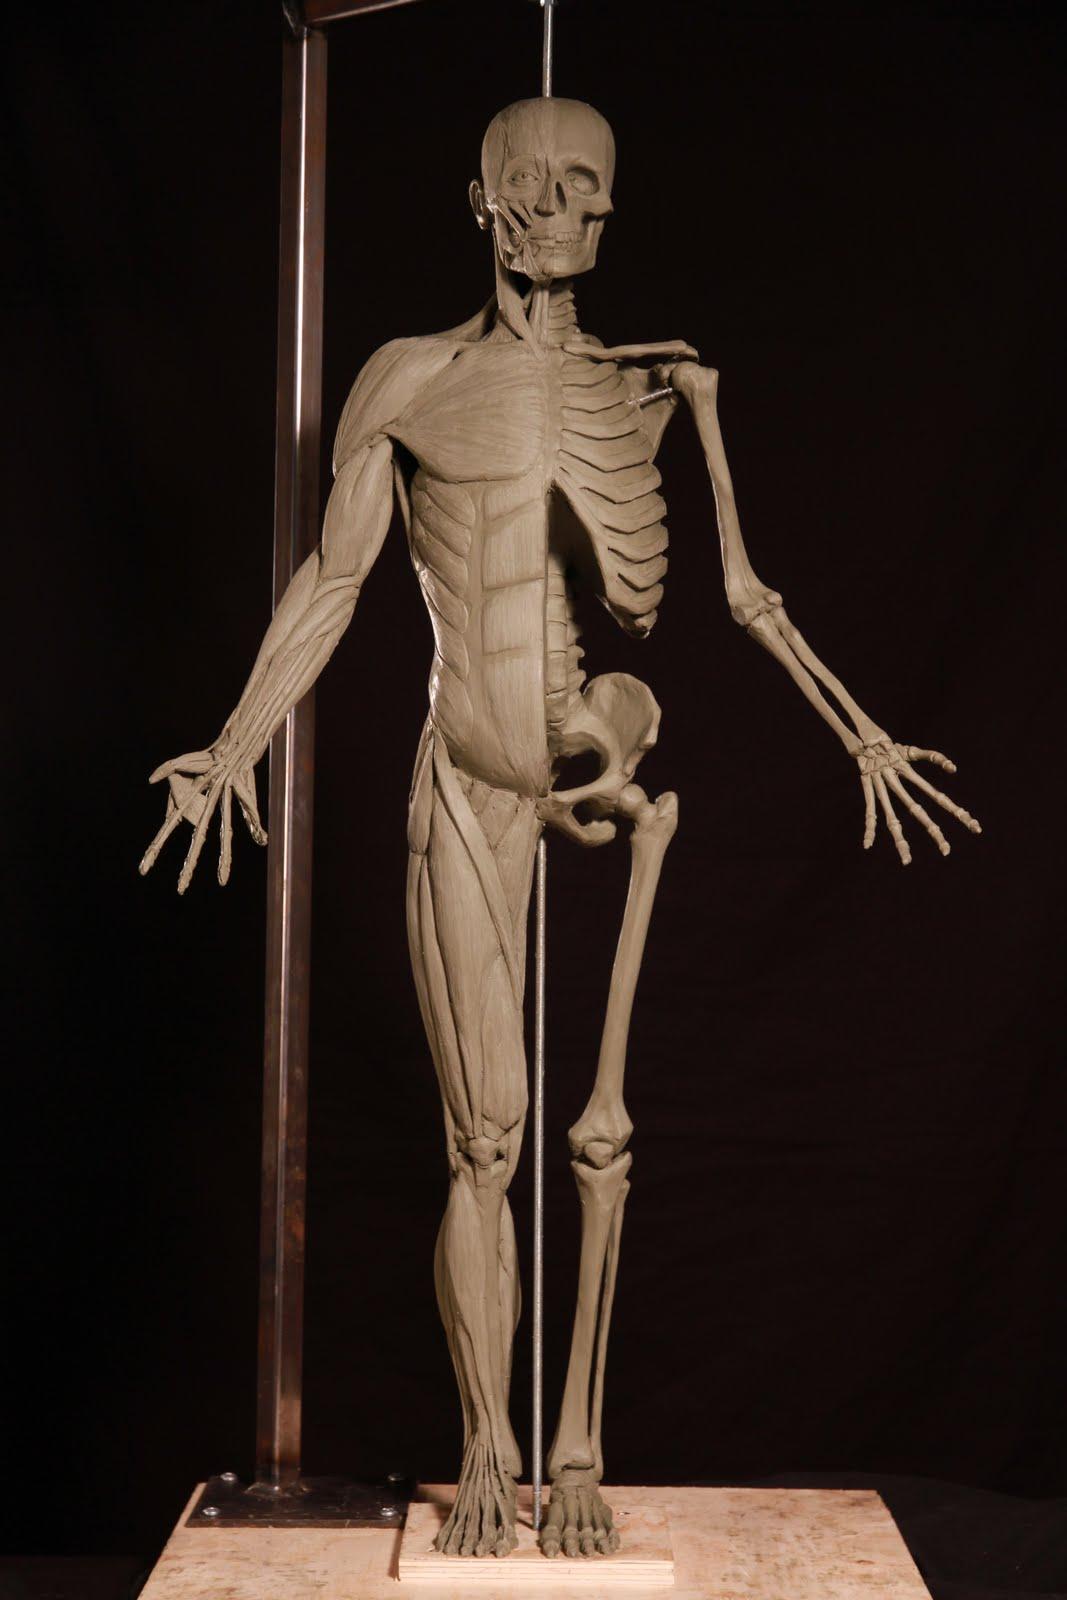 Curiomira: Anatomy and clay